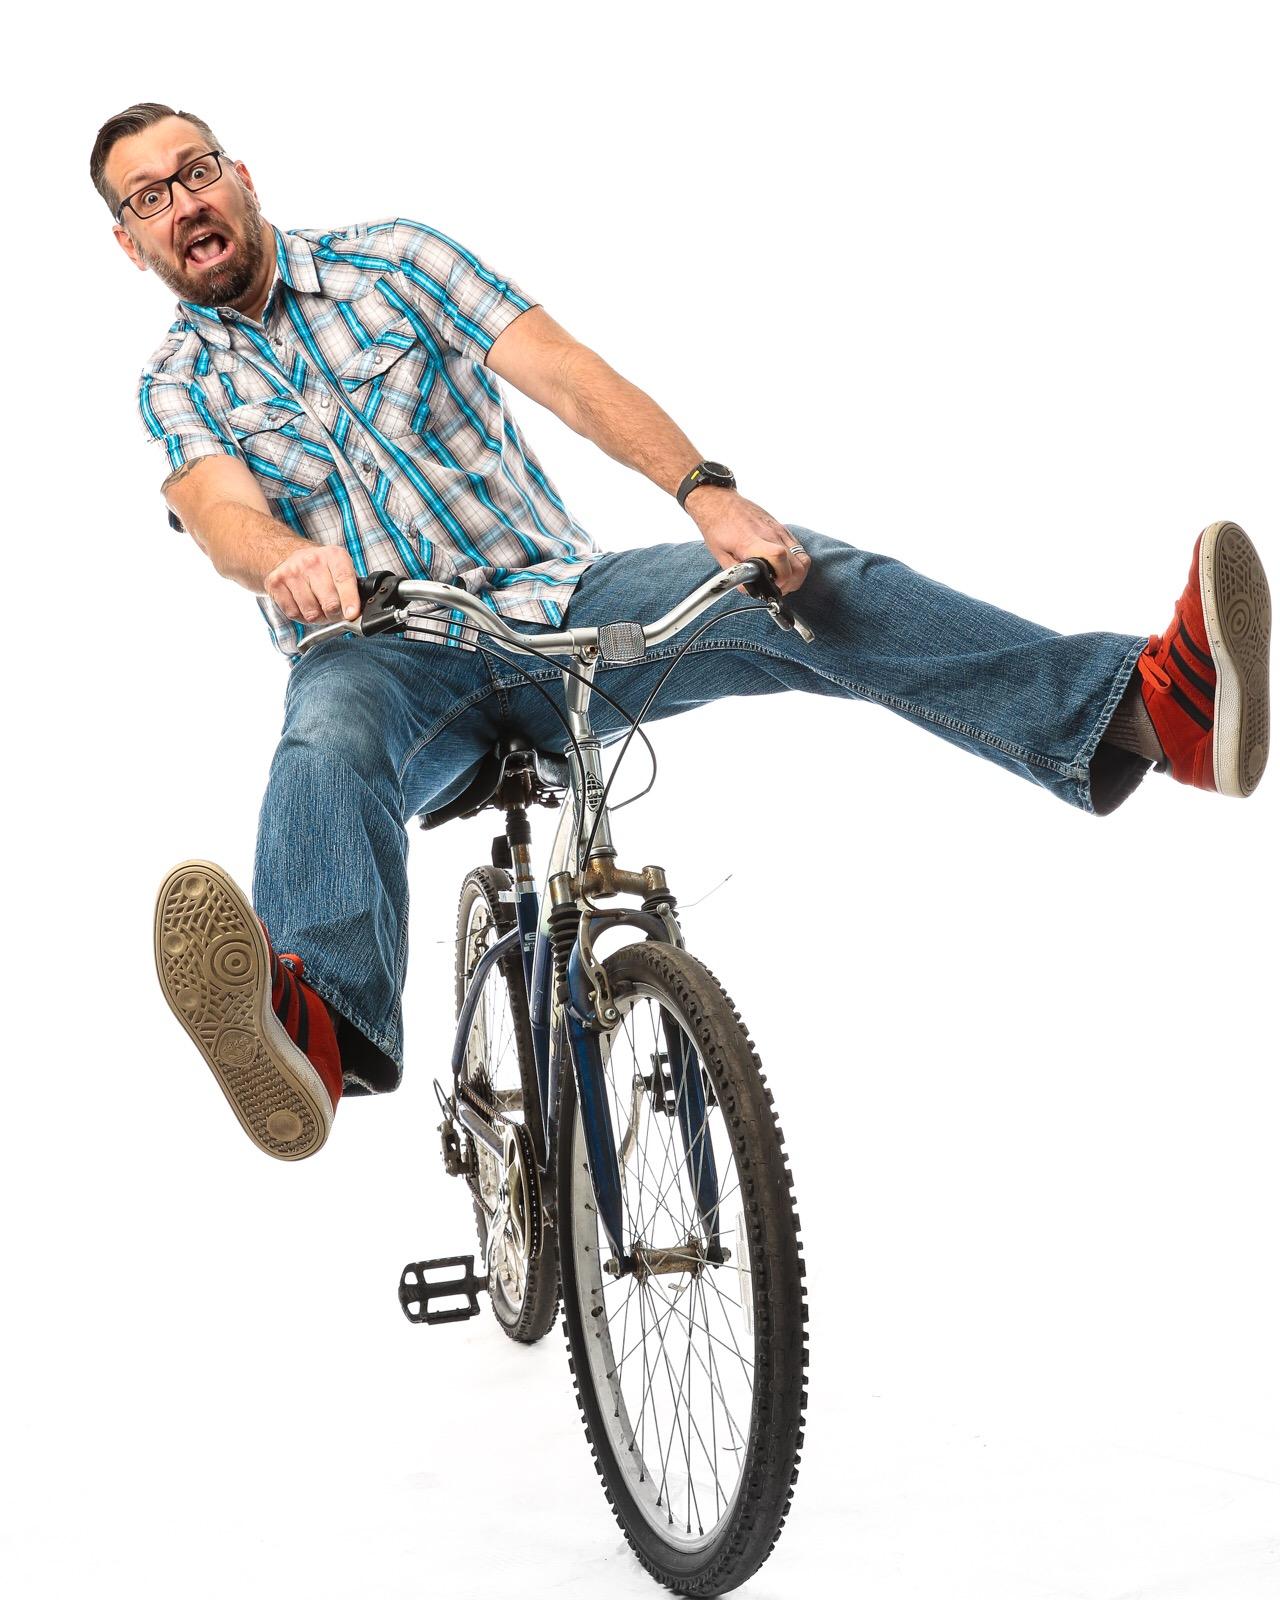 Jason on the Bike